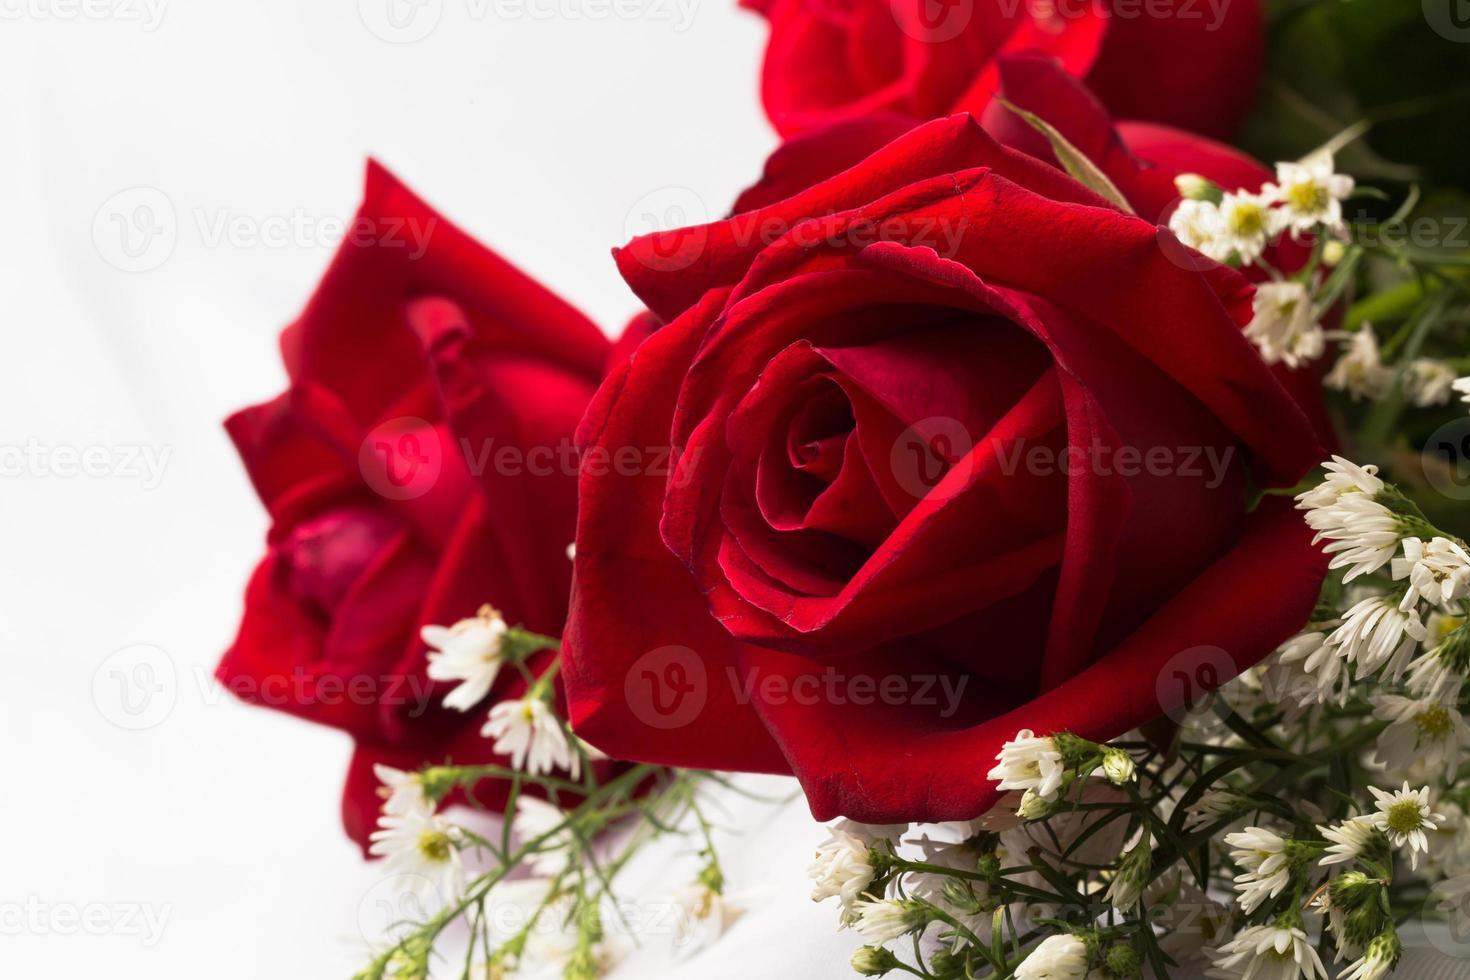 Holland roses close up photo